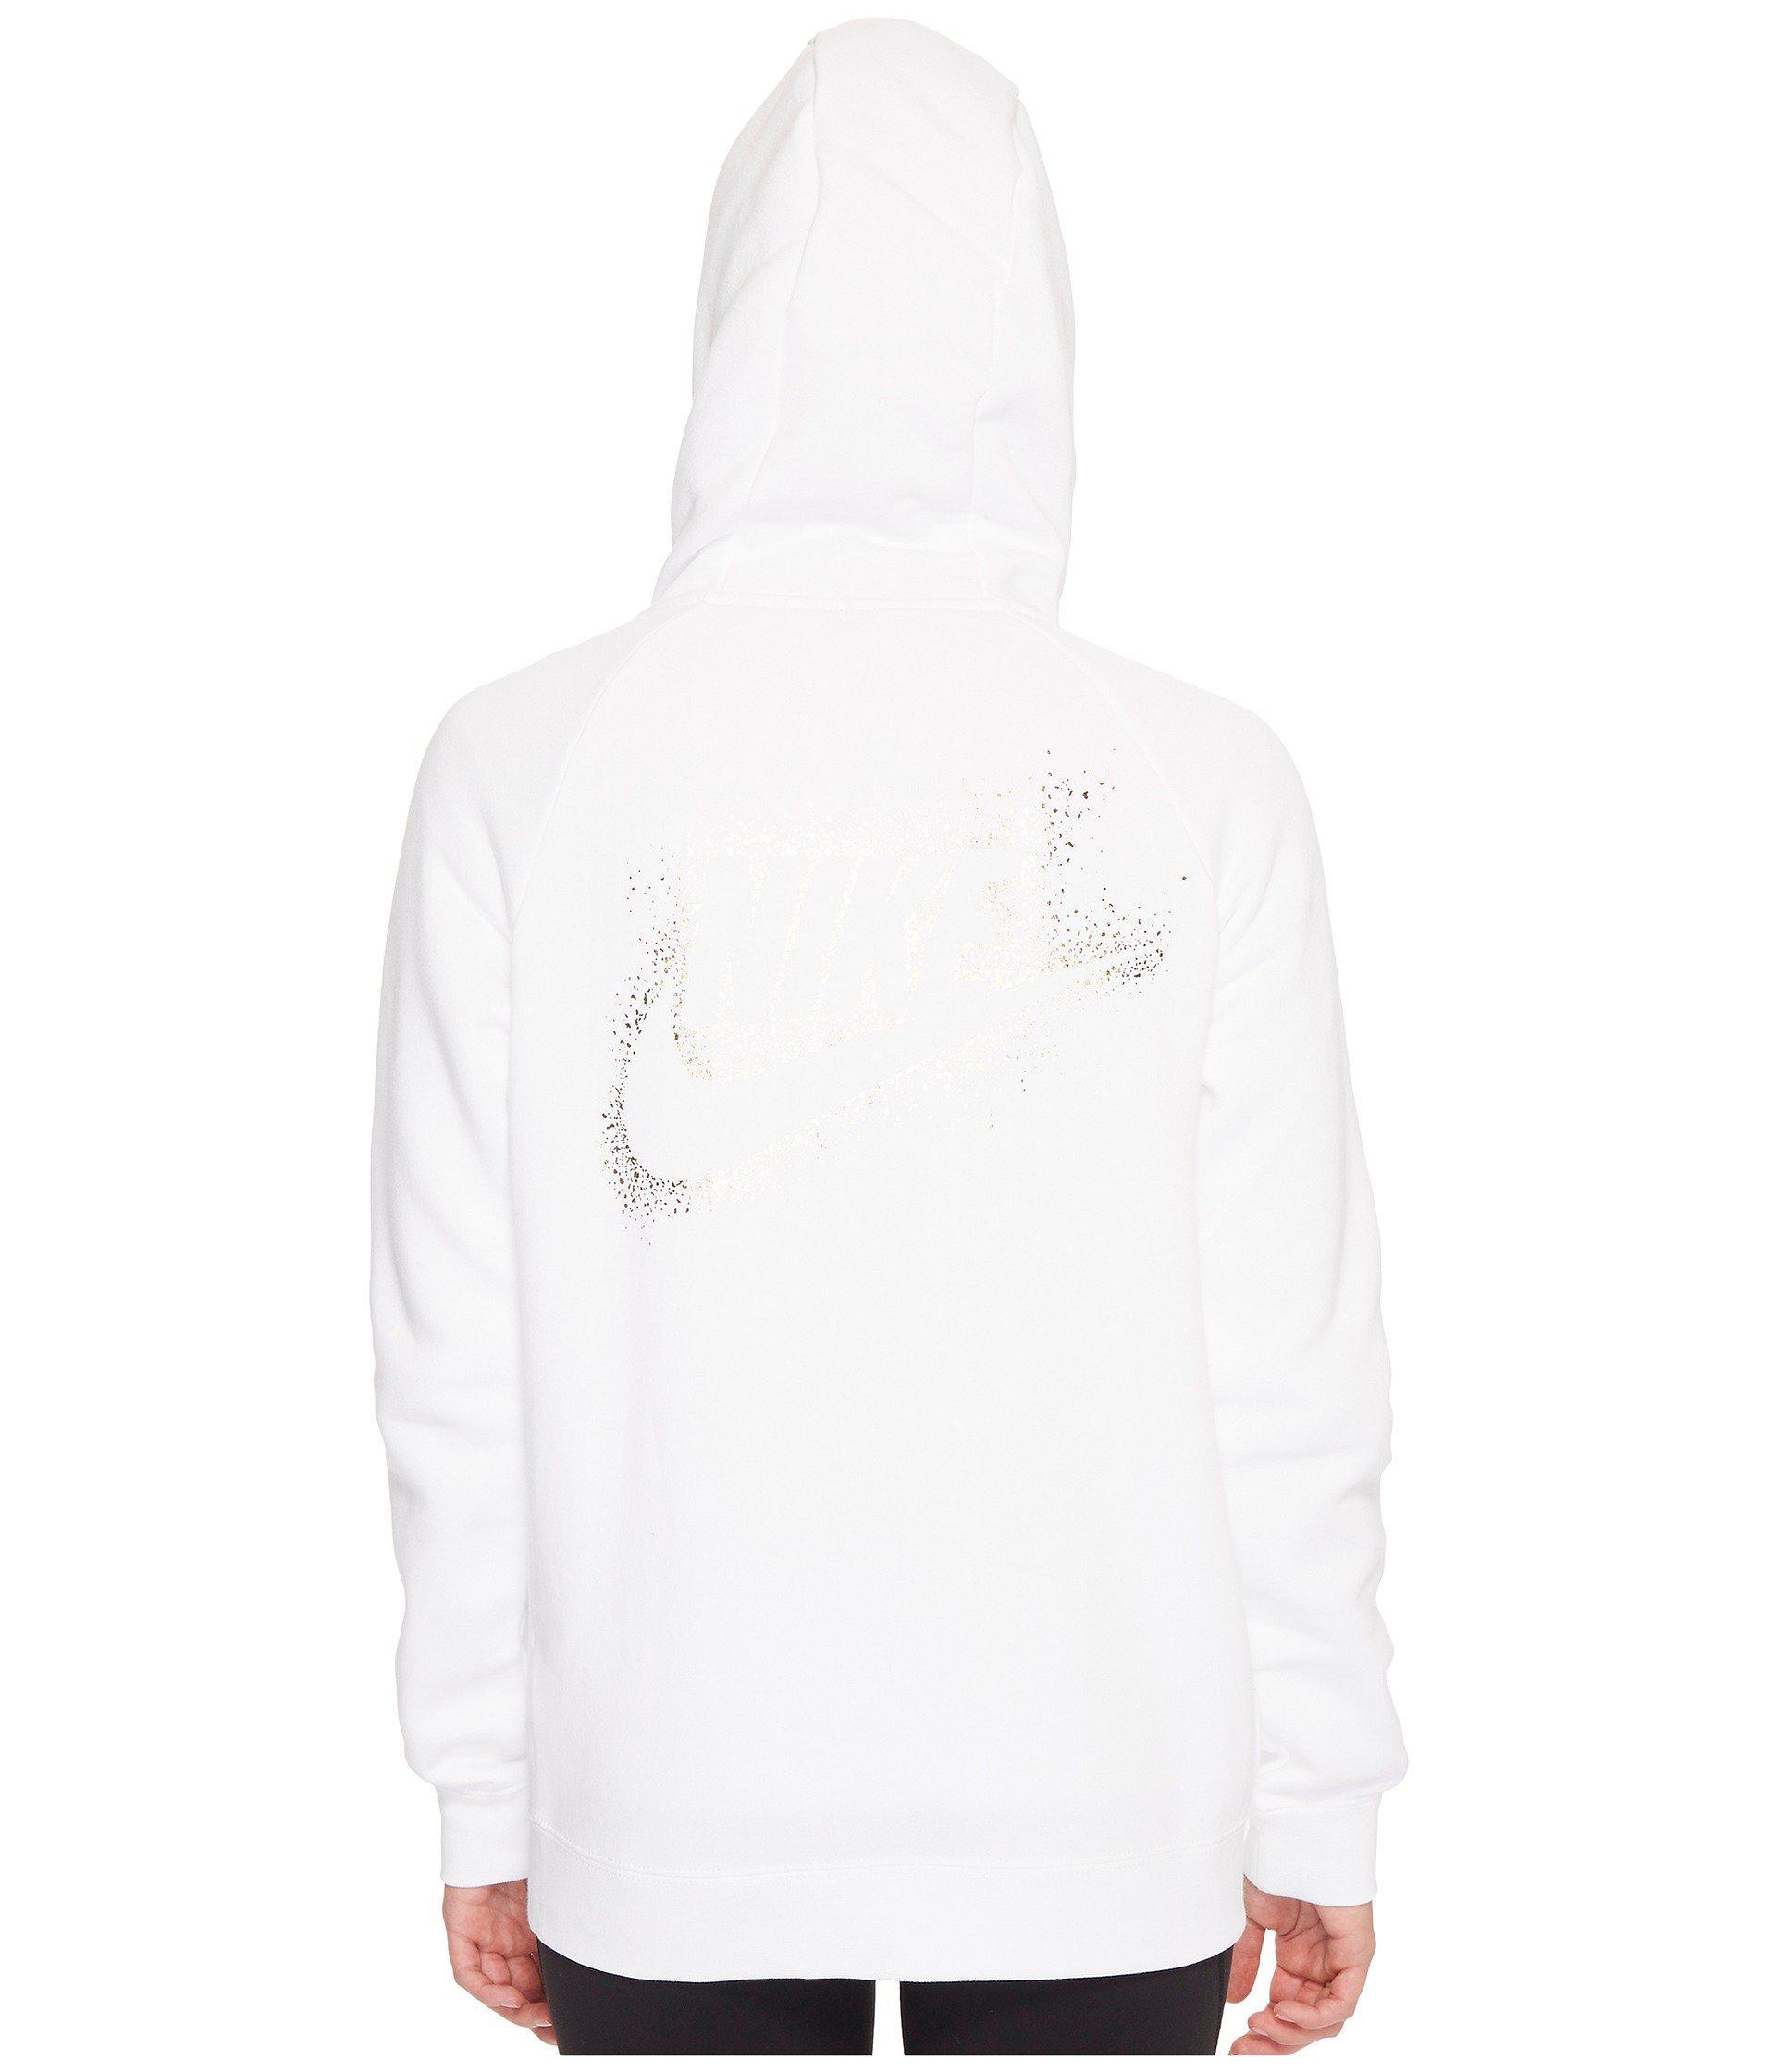 1ede7f9c34b8 Lyst - Nike Sportswear Rally Metallic Full-zip Hoodie in White